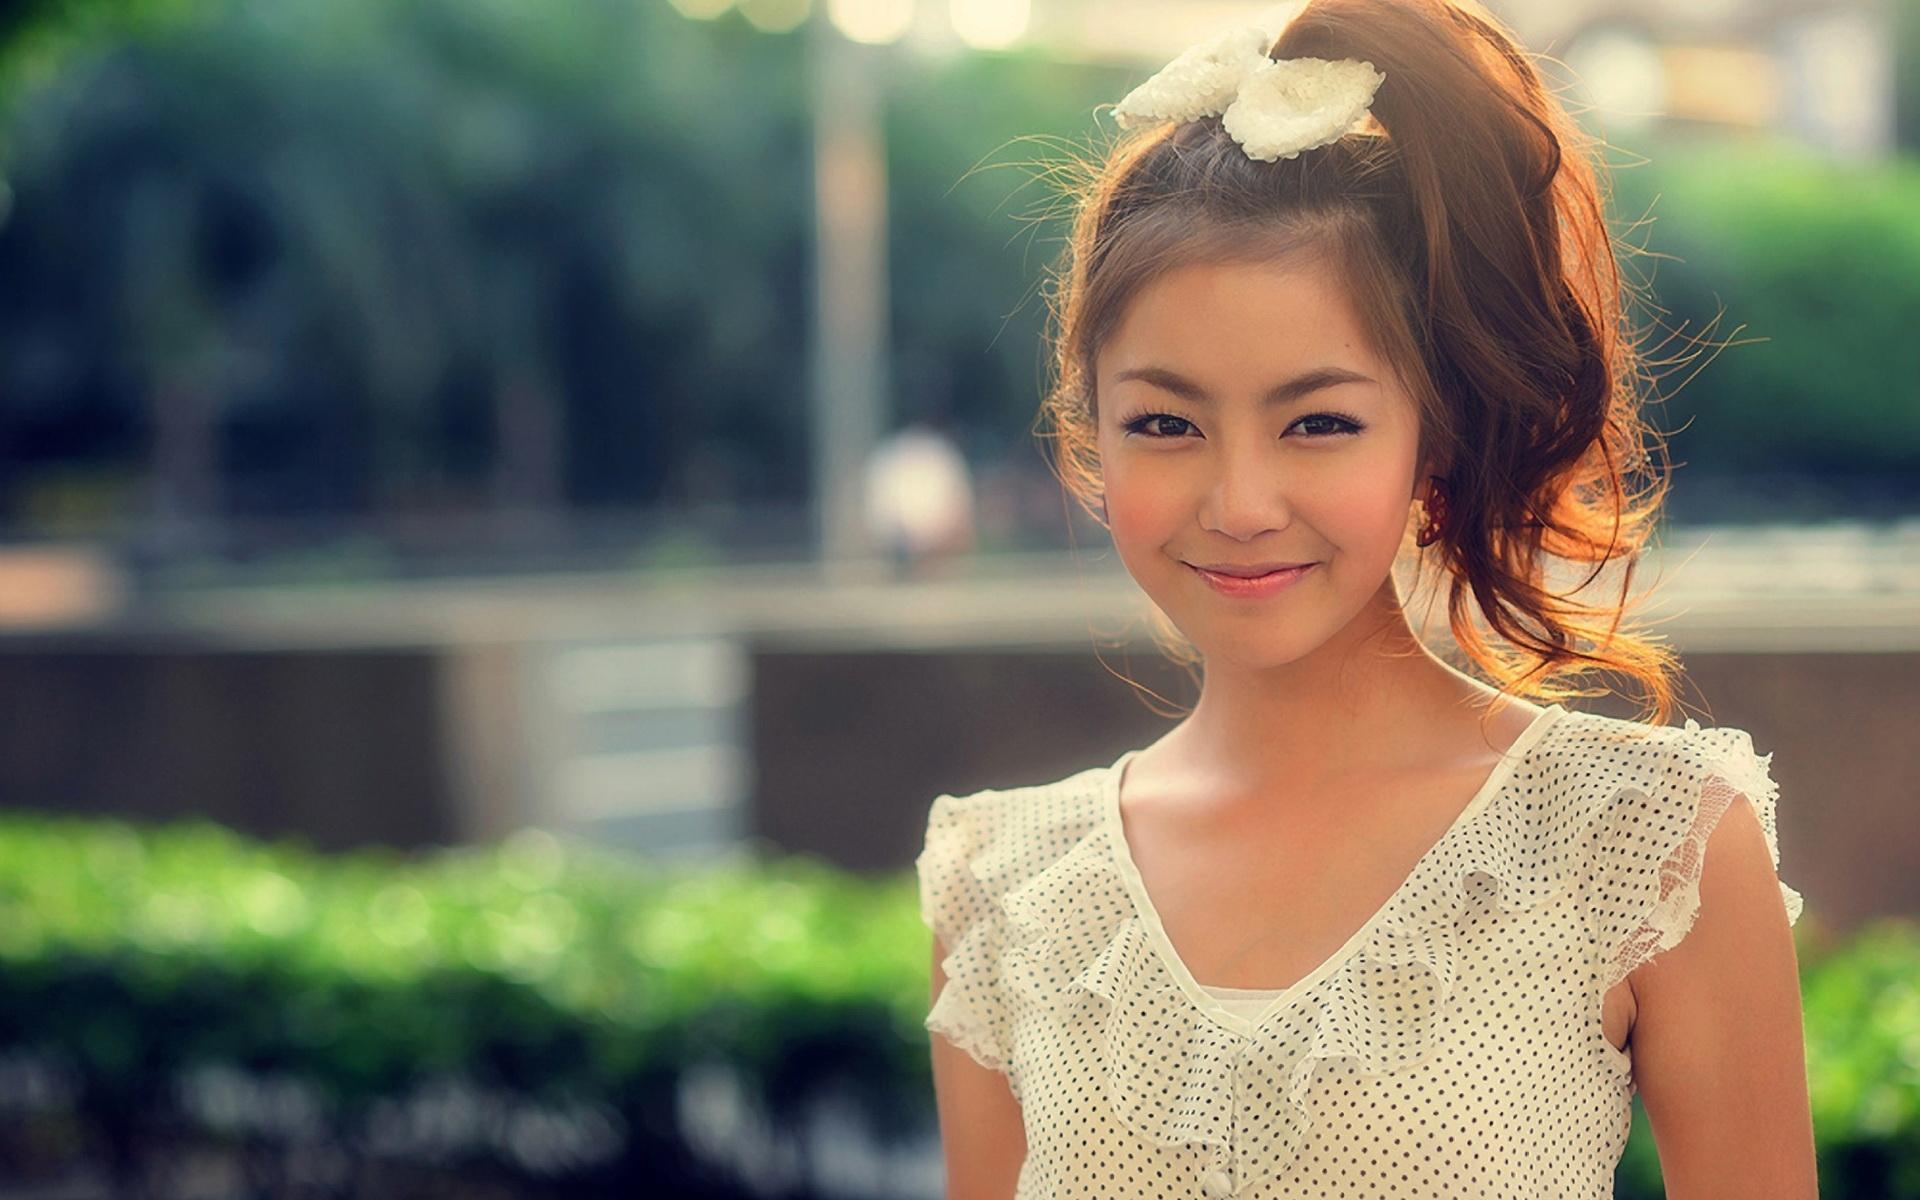 Wallpaper : Asian, smile, face 1920x1200 - goodfon - 643552